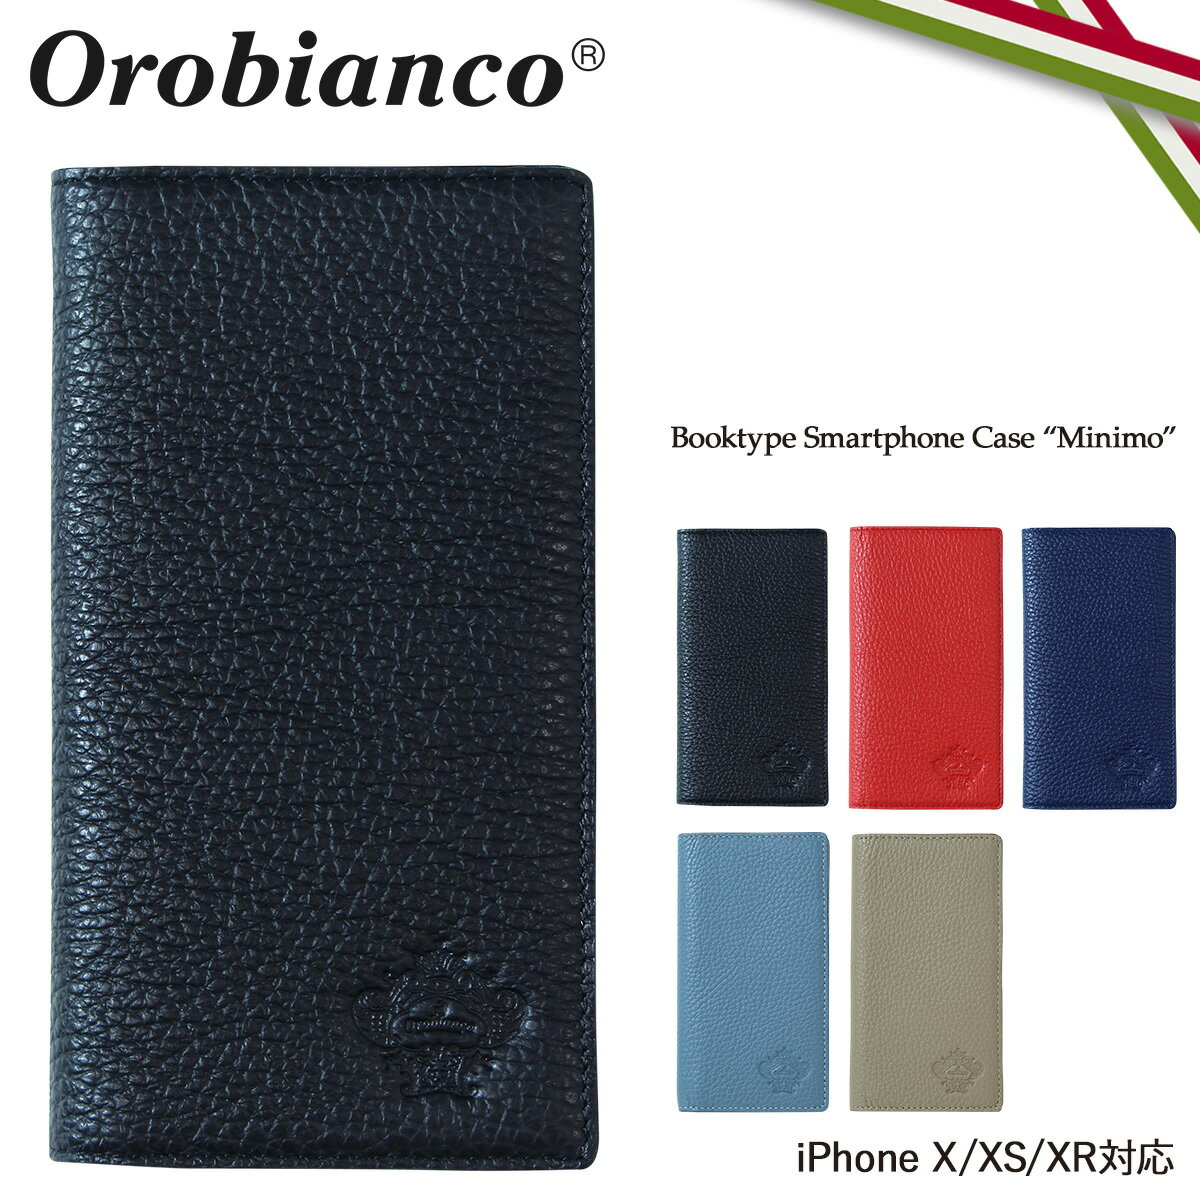 Orobianco オロビアンコ iPhone XR X XS ケース 手帳型 スマホ アイフォン MINIMO レザー メンズ レディース ORIP-0002